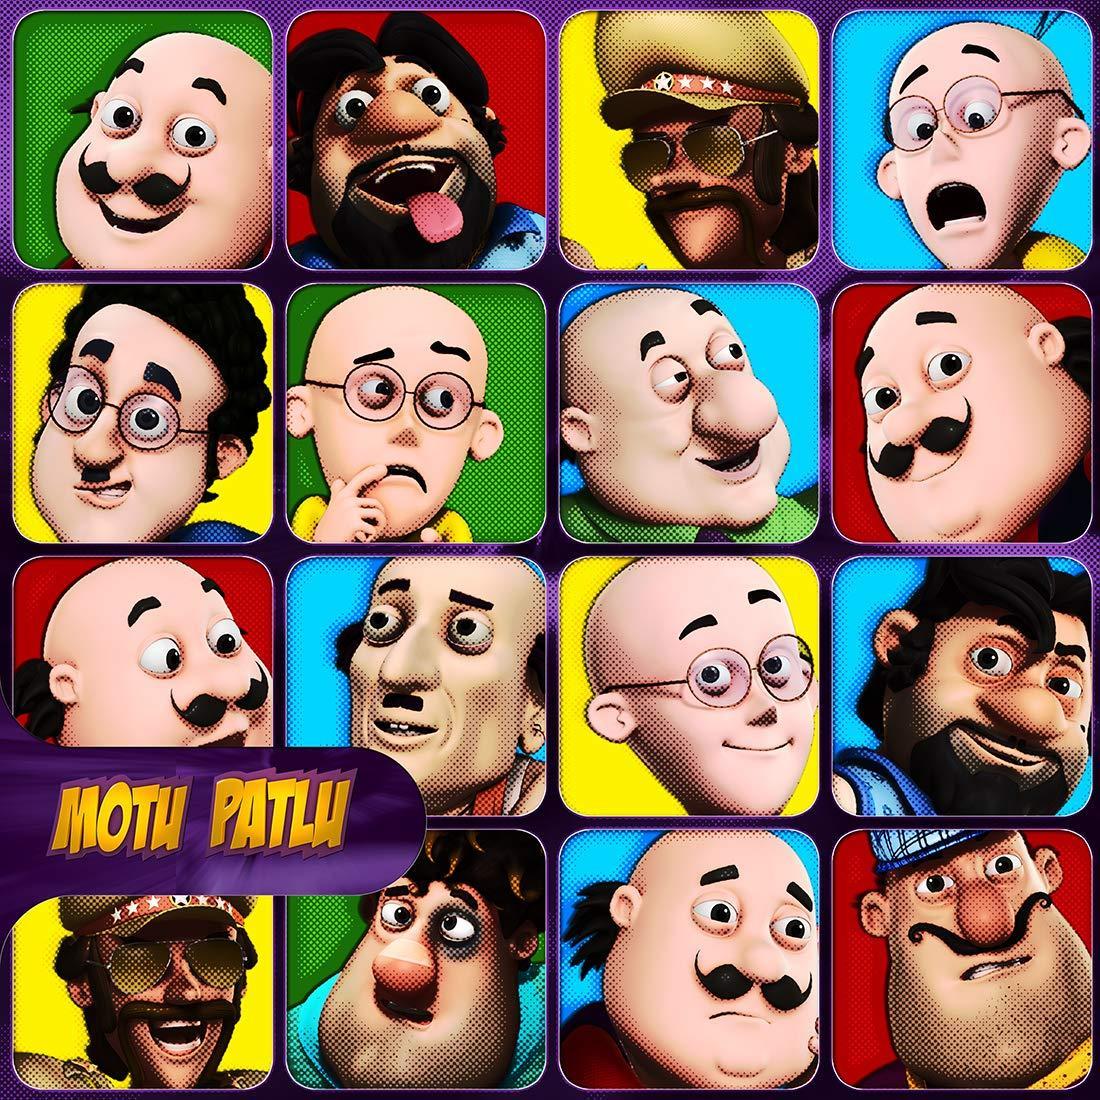 Motu Patlu Wallpapers - Top Free Motu Patlu Backgrounds ...